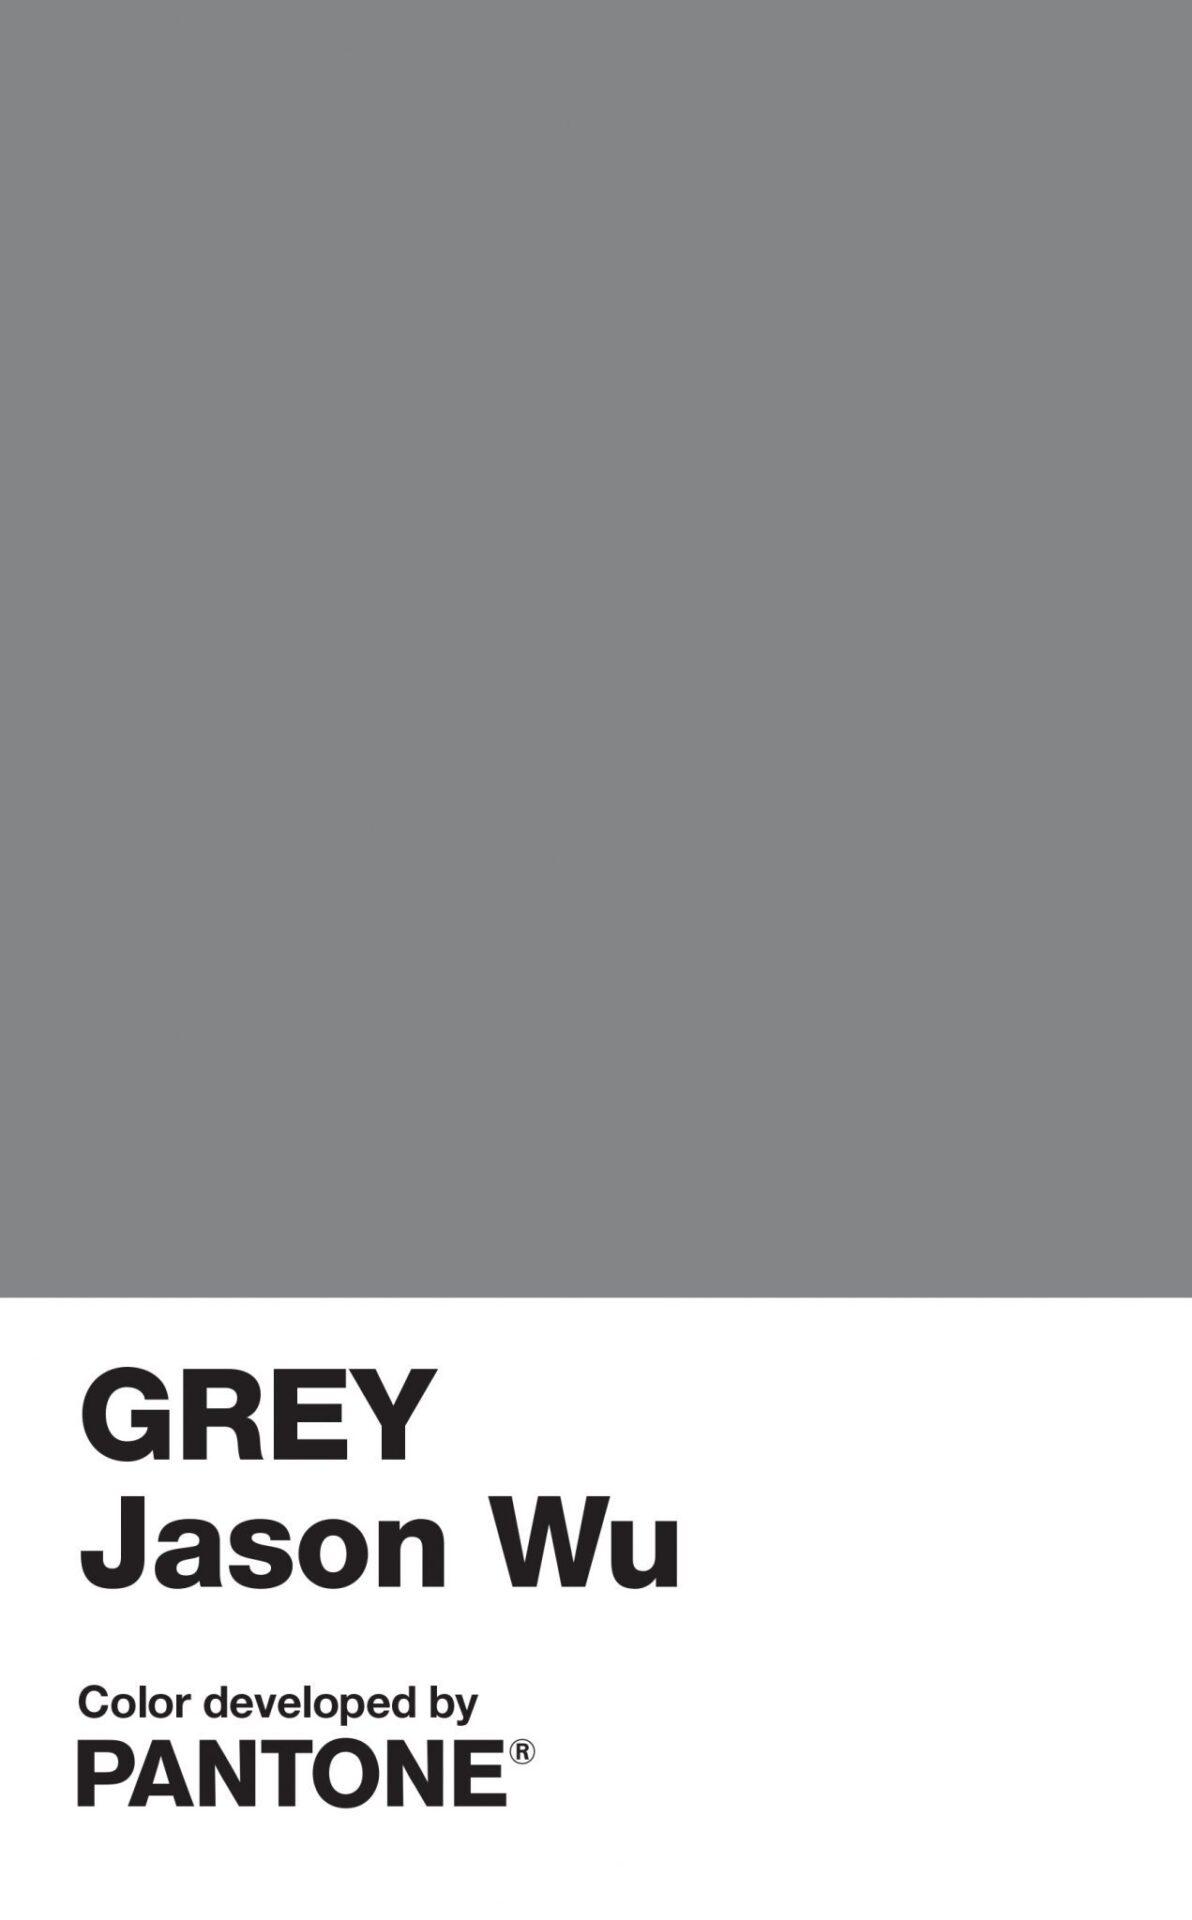 Jason Wu and Pantone Color Institute unveil GREY Jason Wu